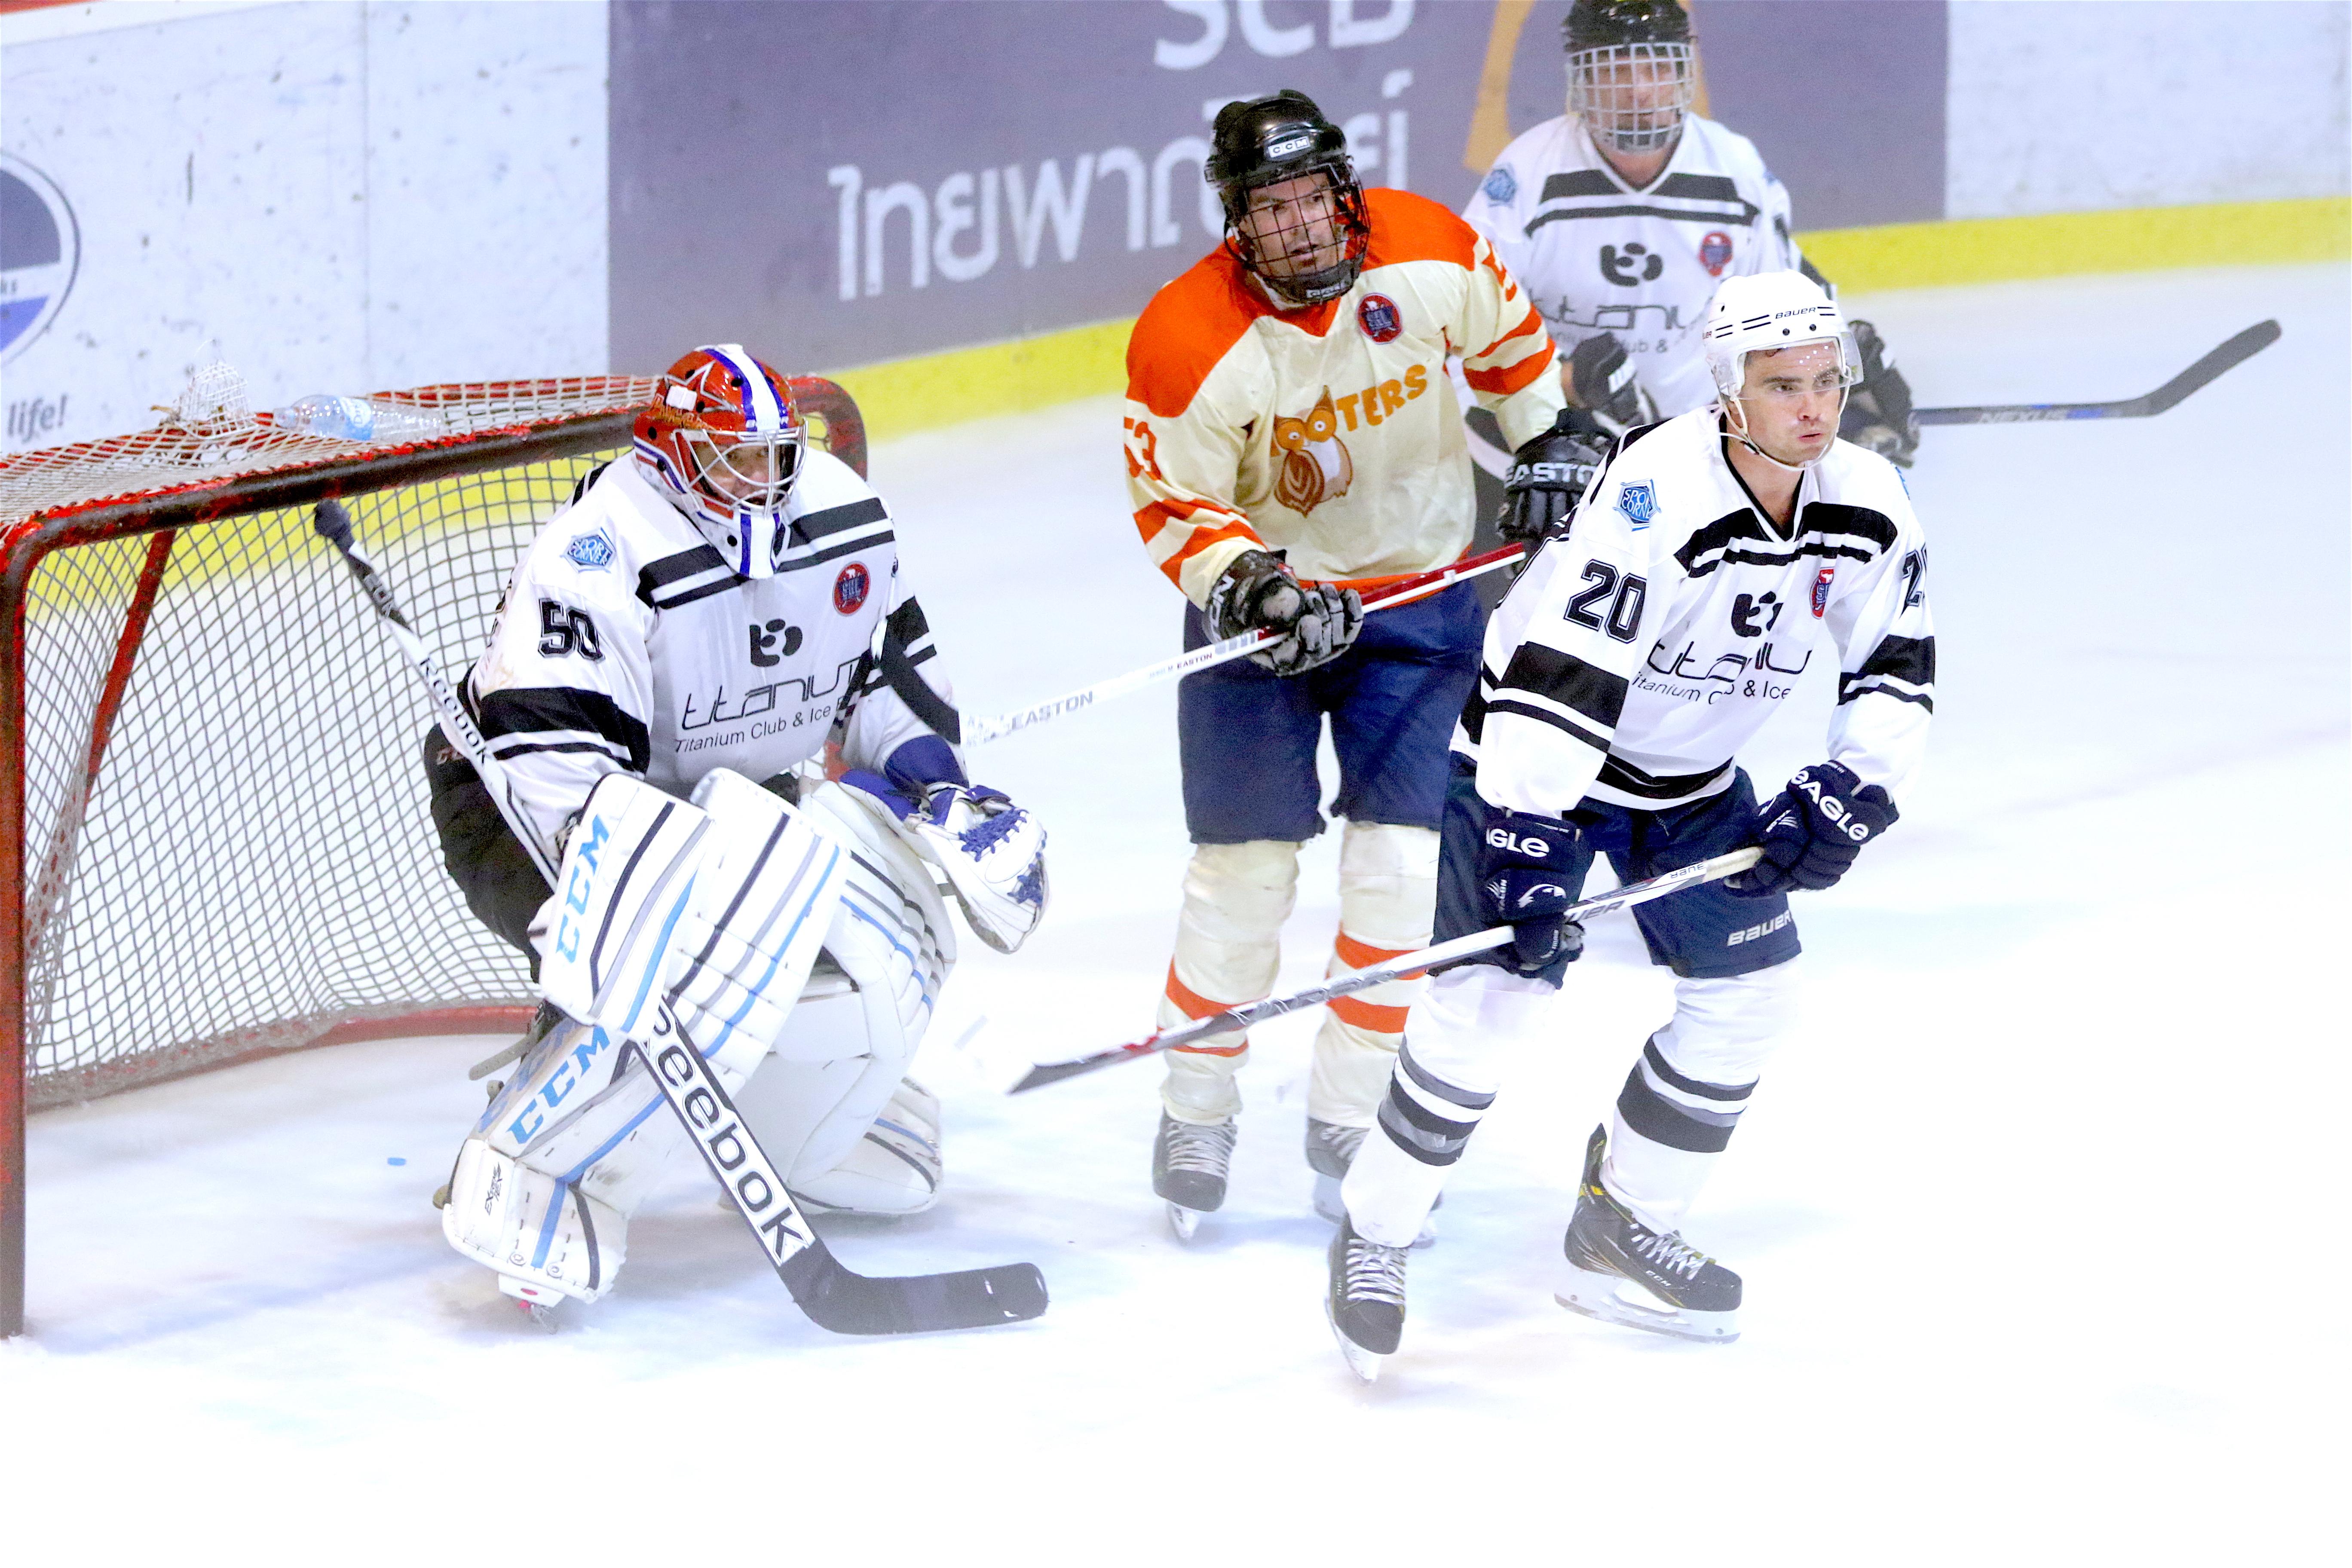 Sport Corner/Titanium and Hooters Nana are two of the teams competing in the new Thailand ice hockey league based in Bangkok. (Photo/Tadamasa Nagayama)